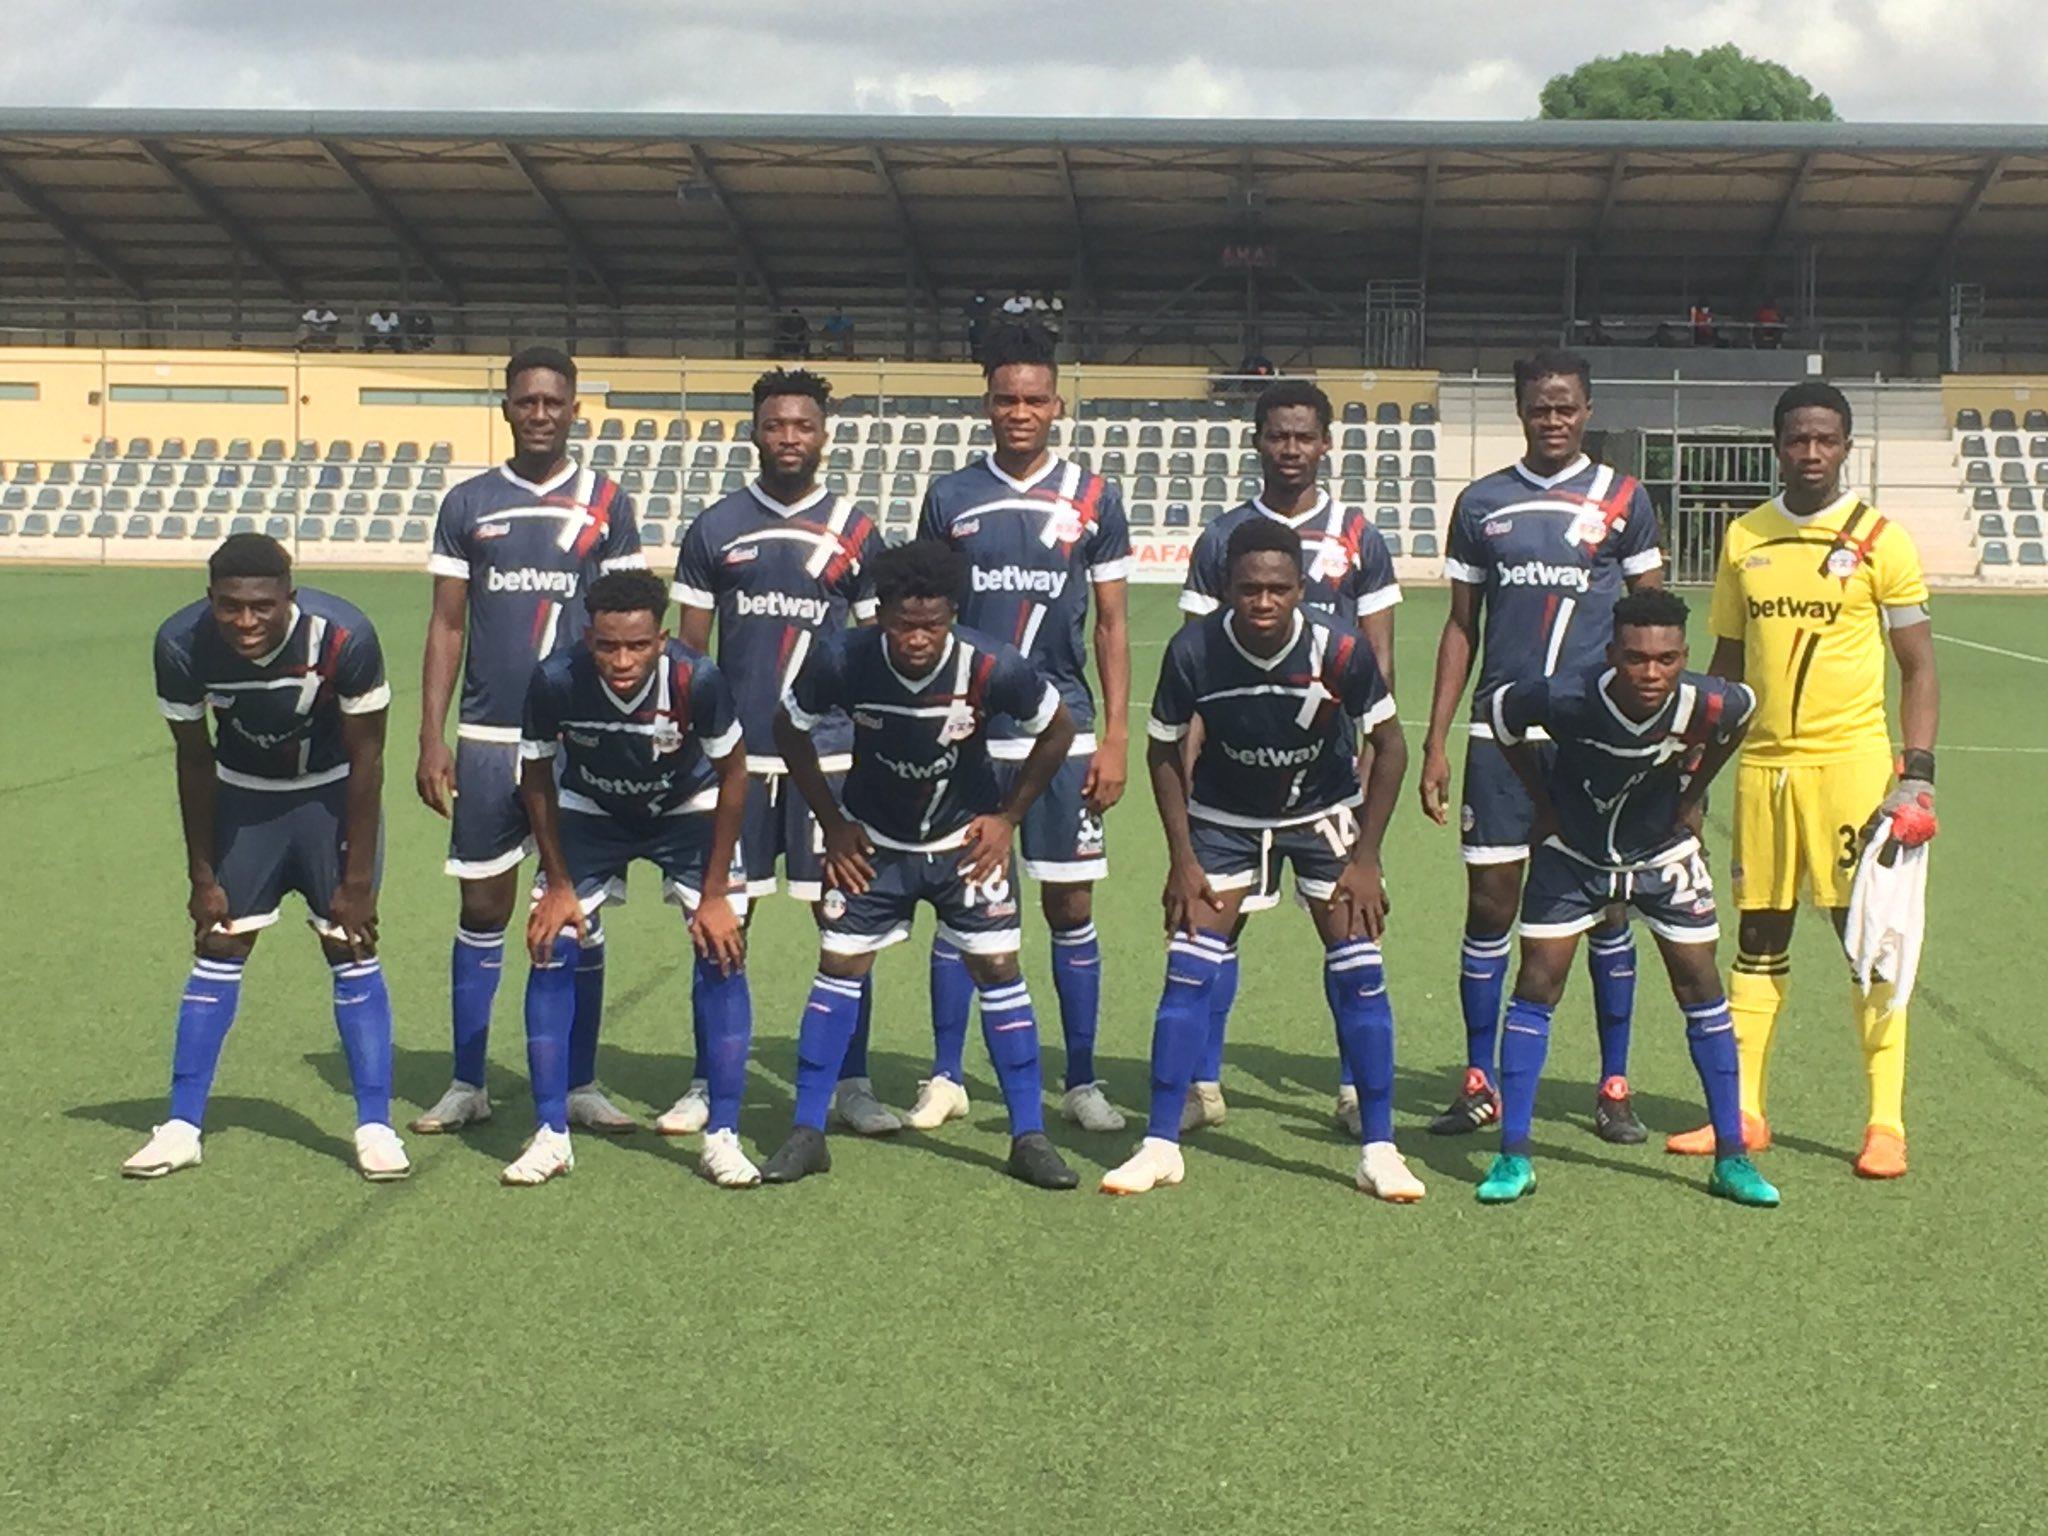 GPL: Kweku Karikari's goal over Eleven Wonders gives Liberty's survival hopes a boost